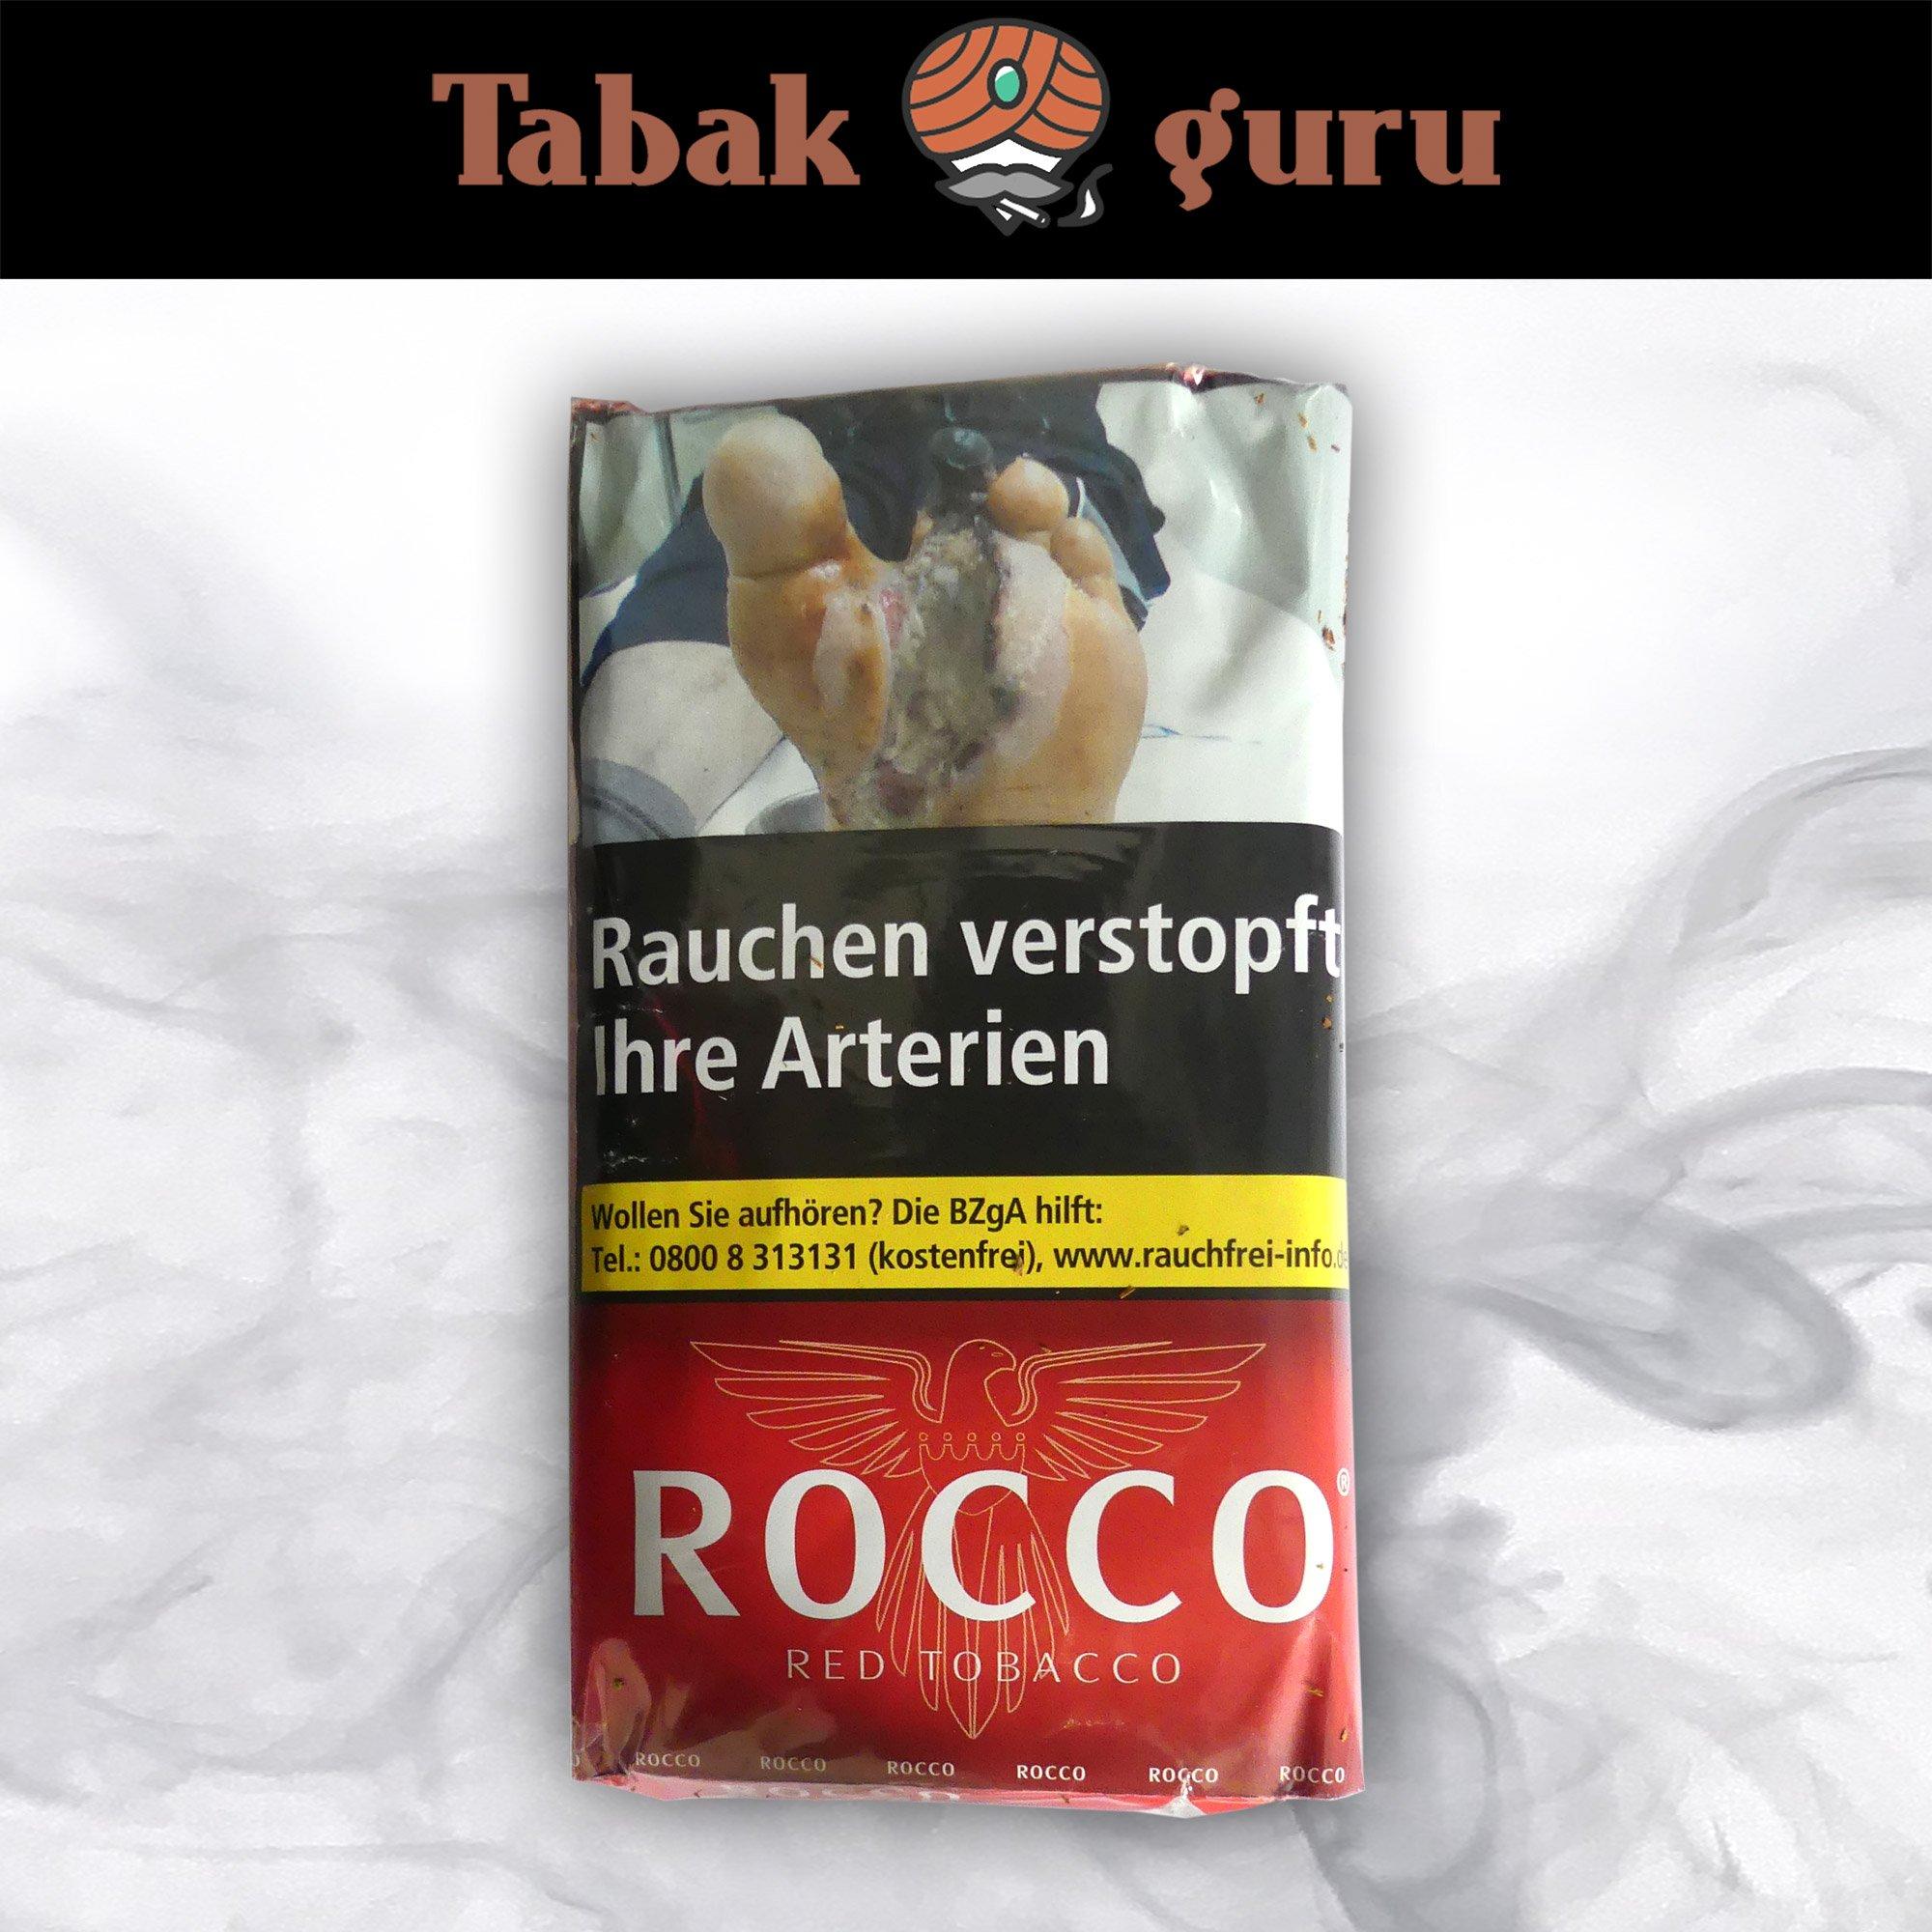 ROCCO Red Tobacco Drehtabak 38 g